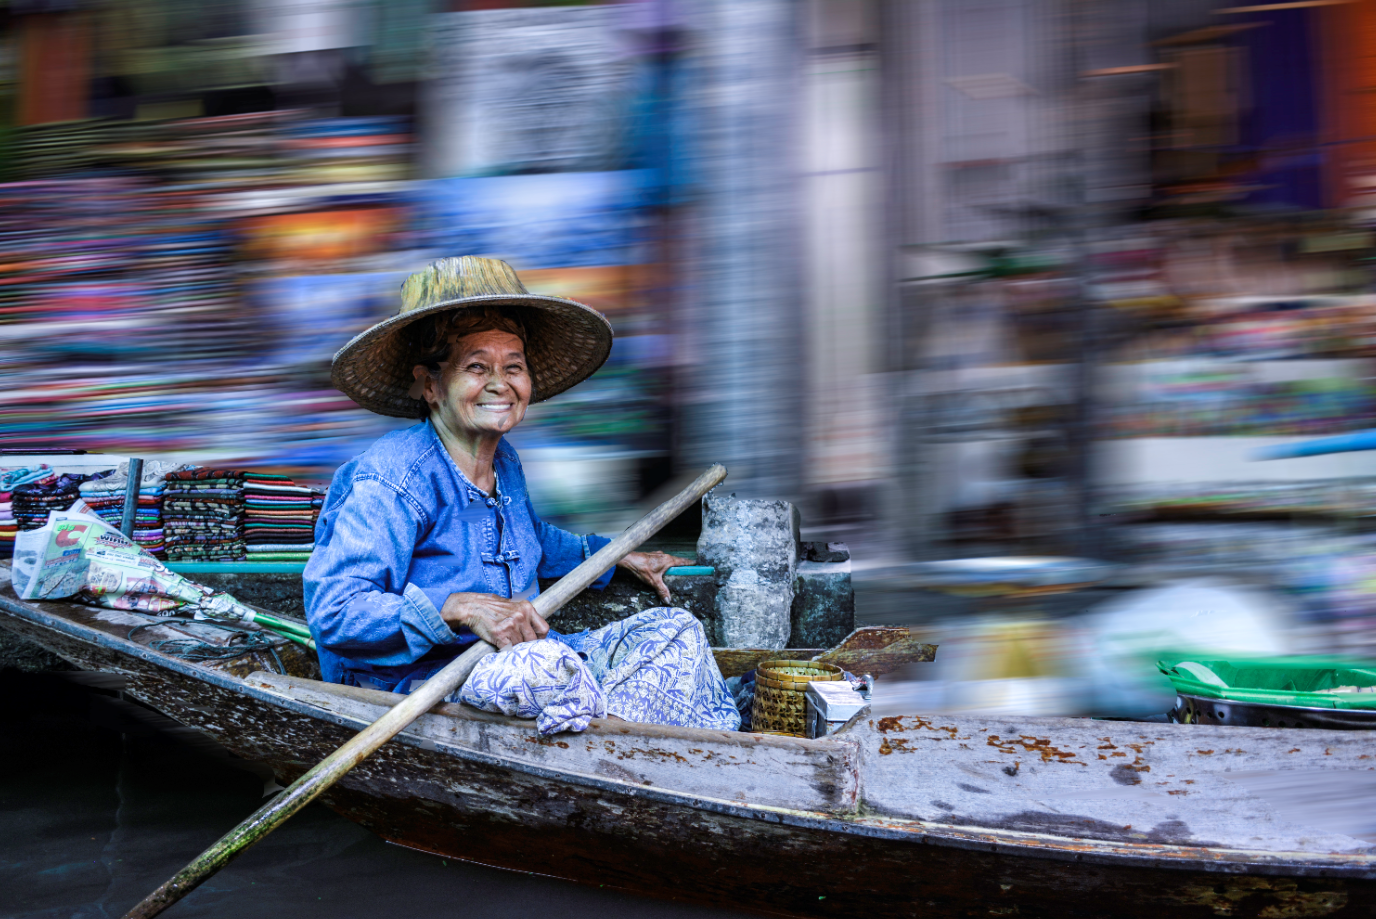 Floating Market by Bransha Gautier